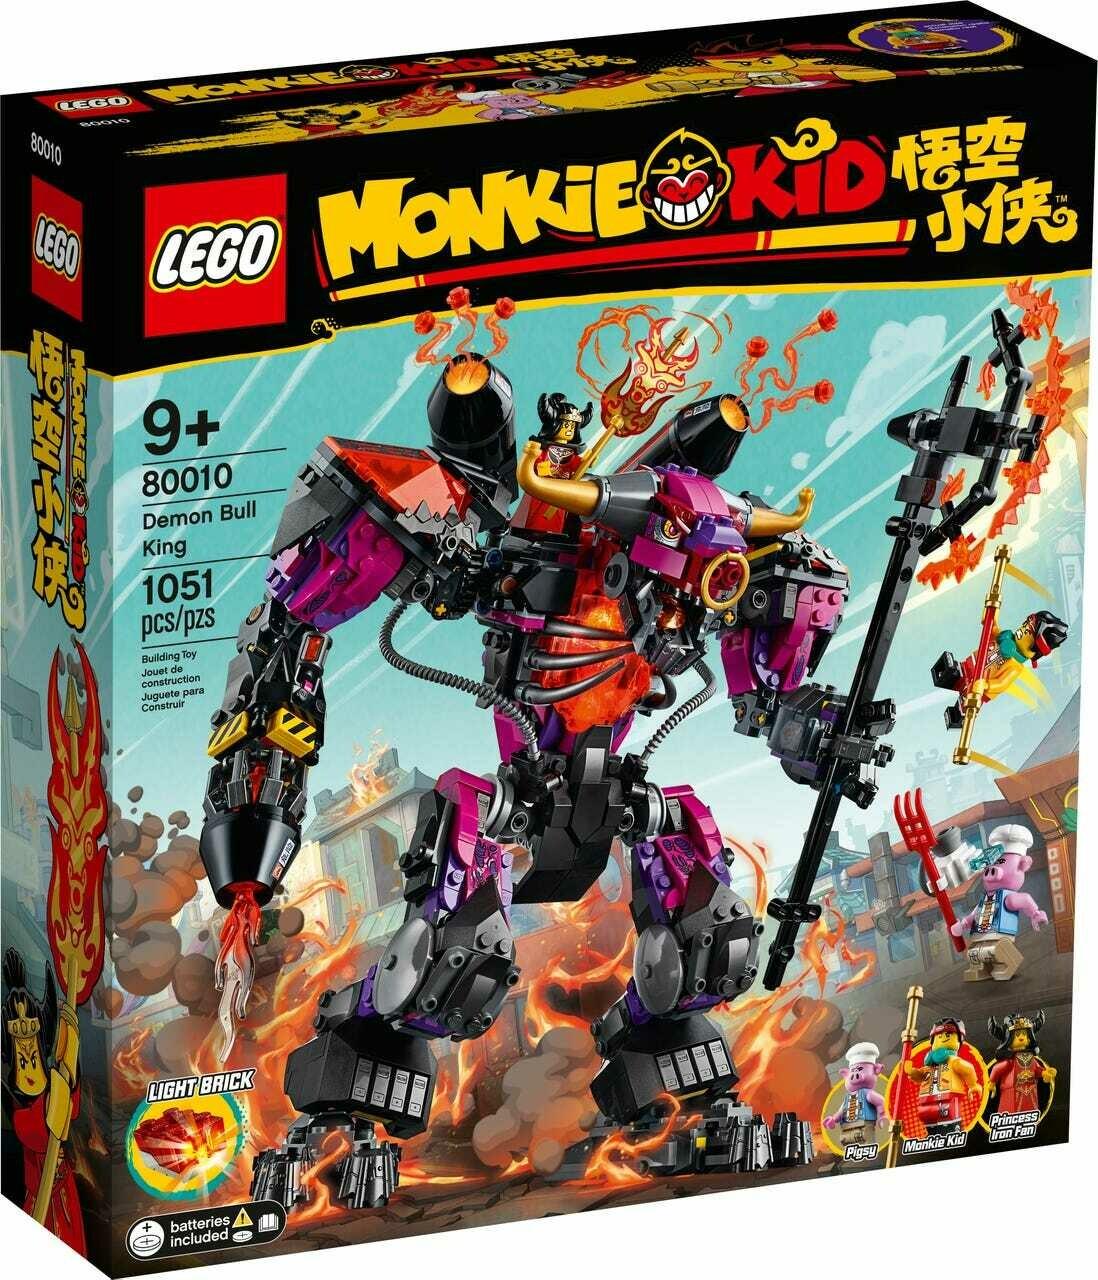 Конструктор LEGO Monkie Kid 80010 Царь быков